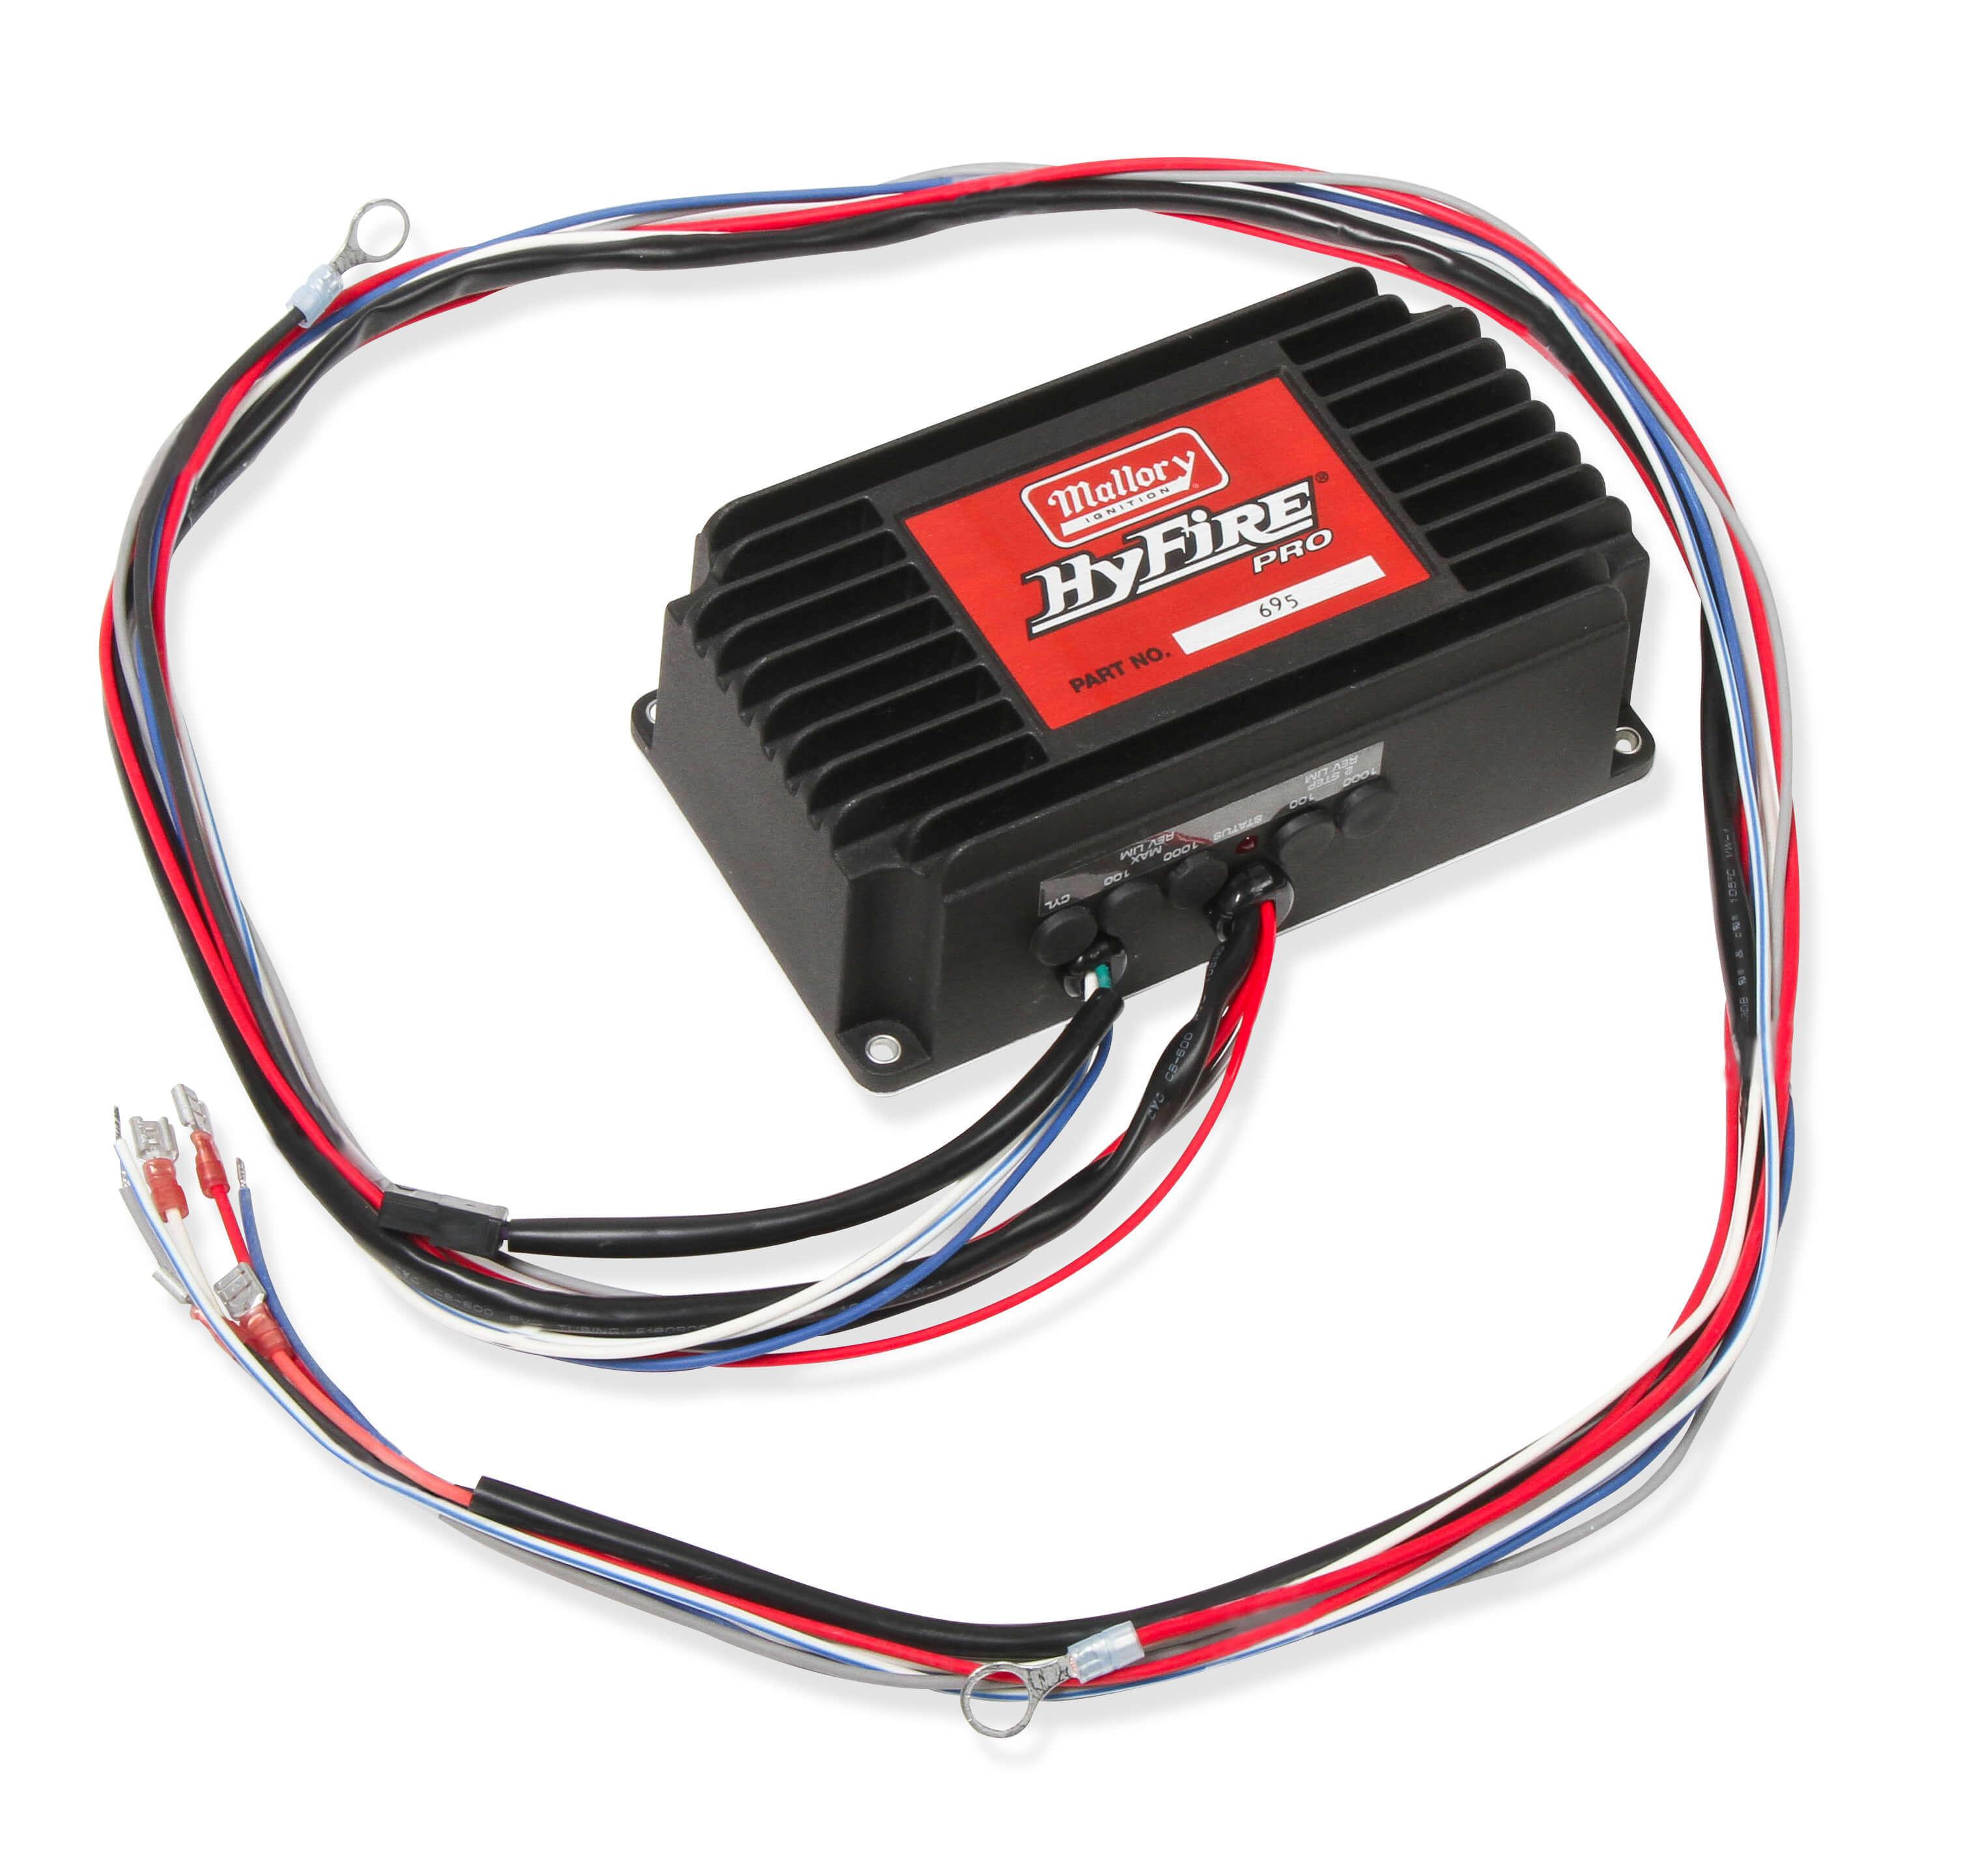 HyFire Pro Ignition Box